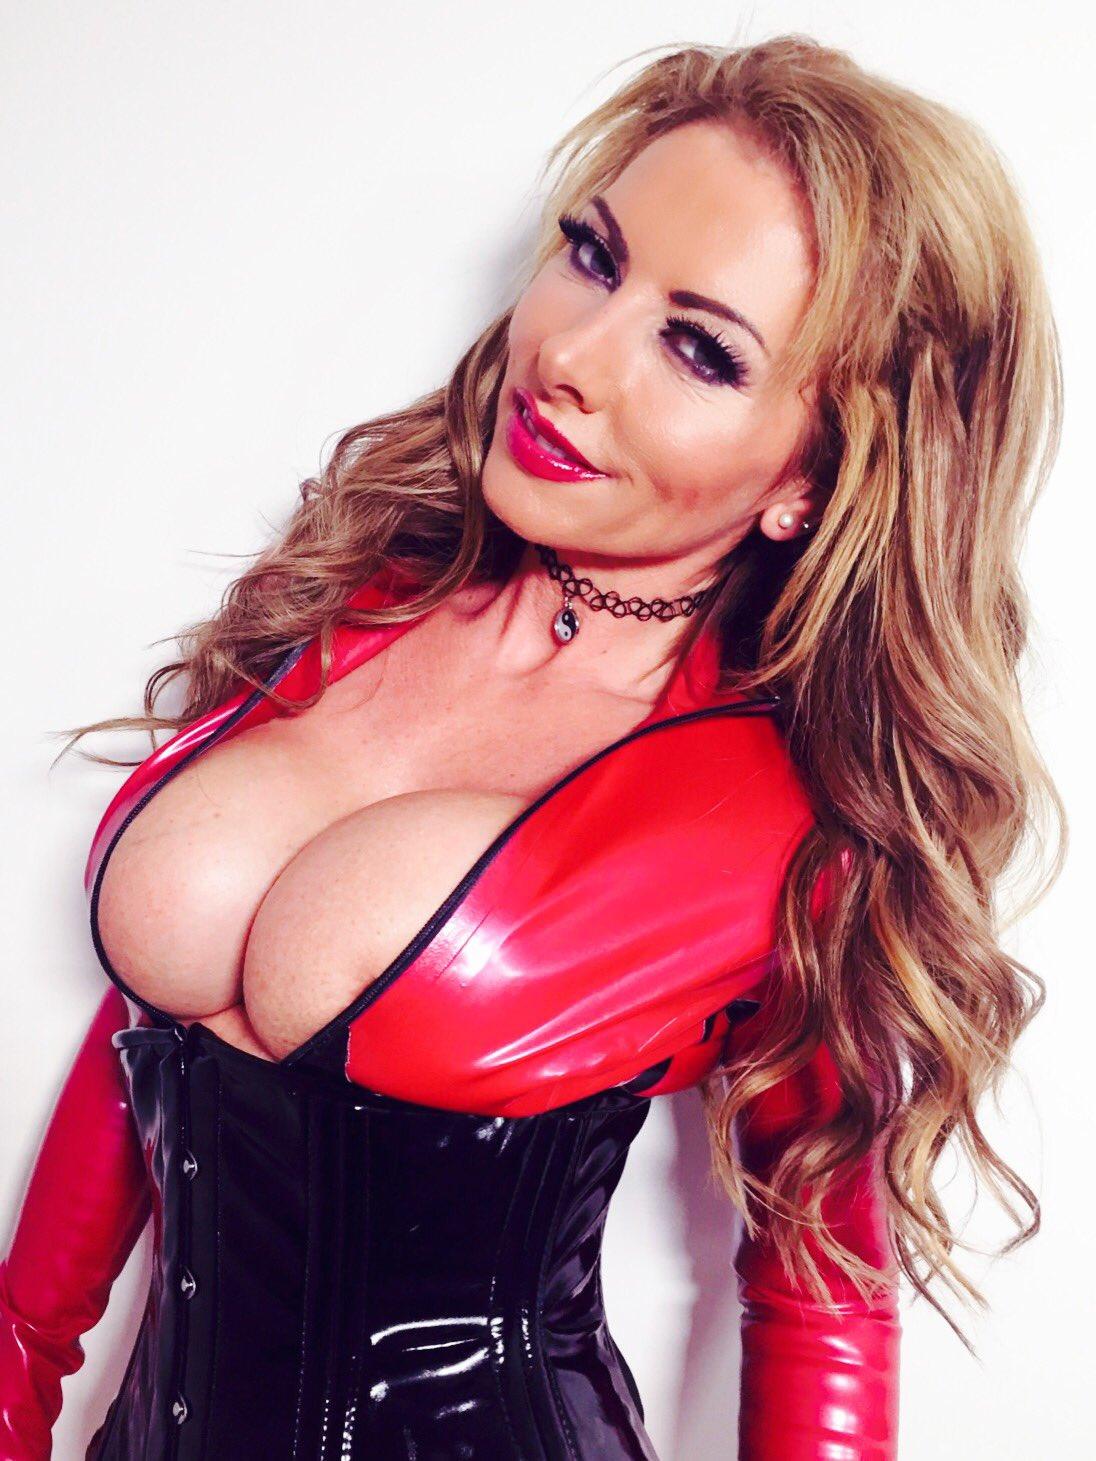 Uk milfs red and penny are britain039s naughtiest secretaries - 3 part 4